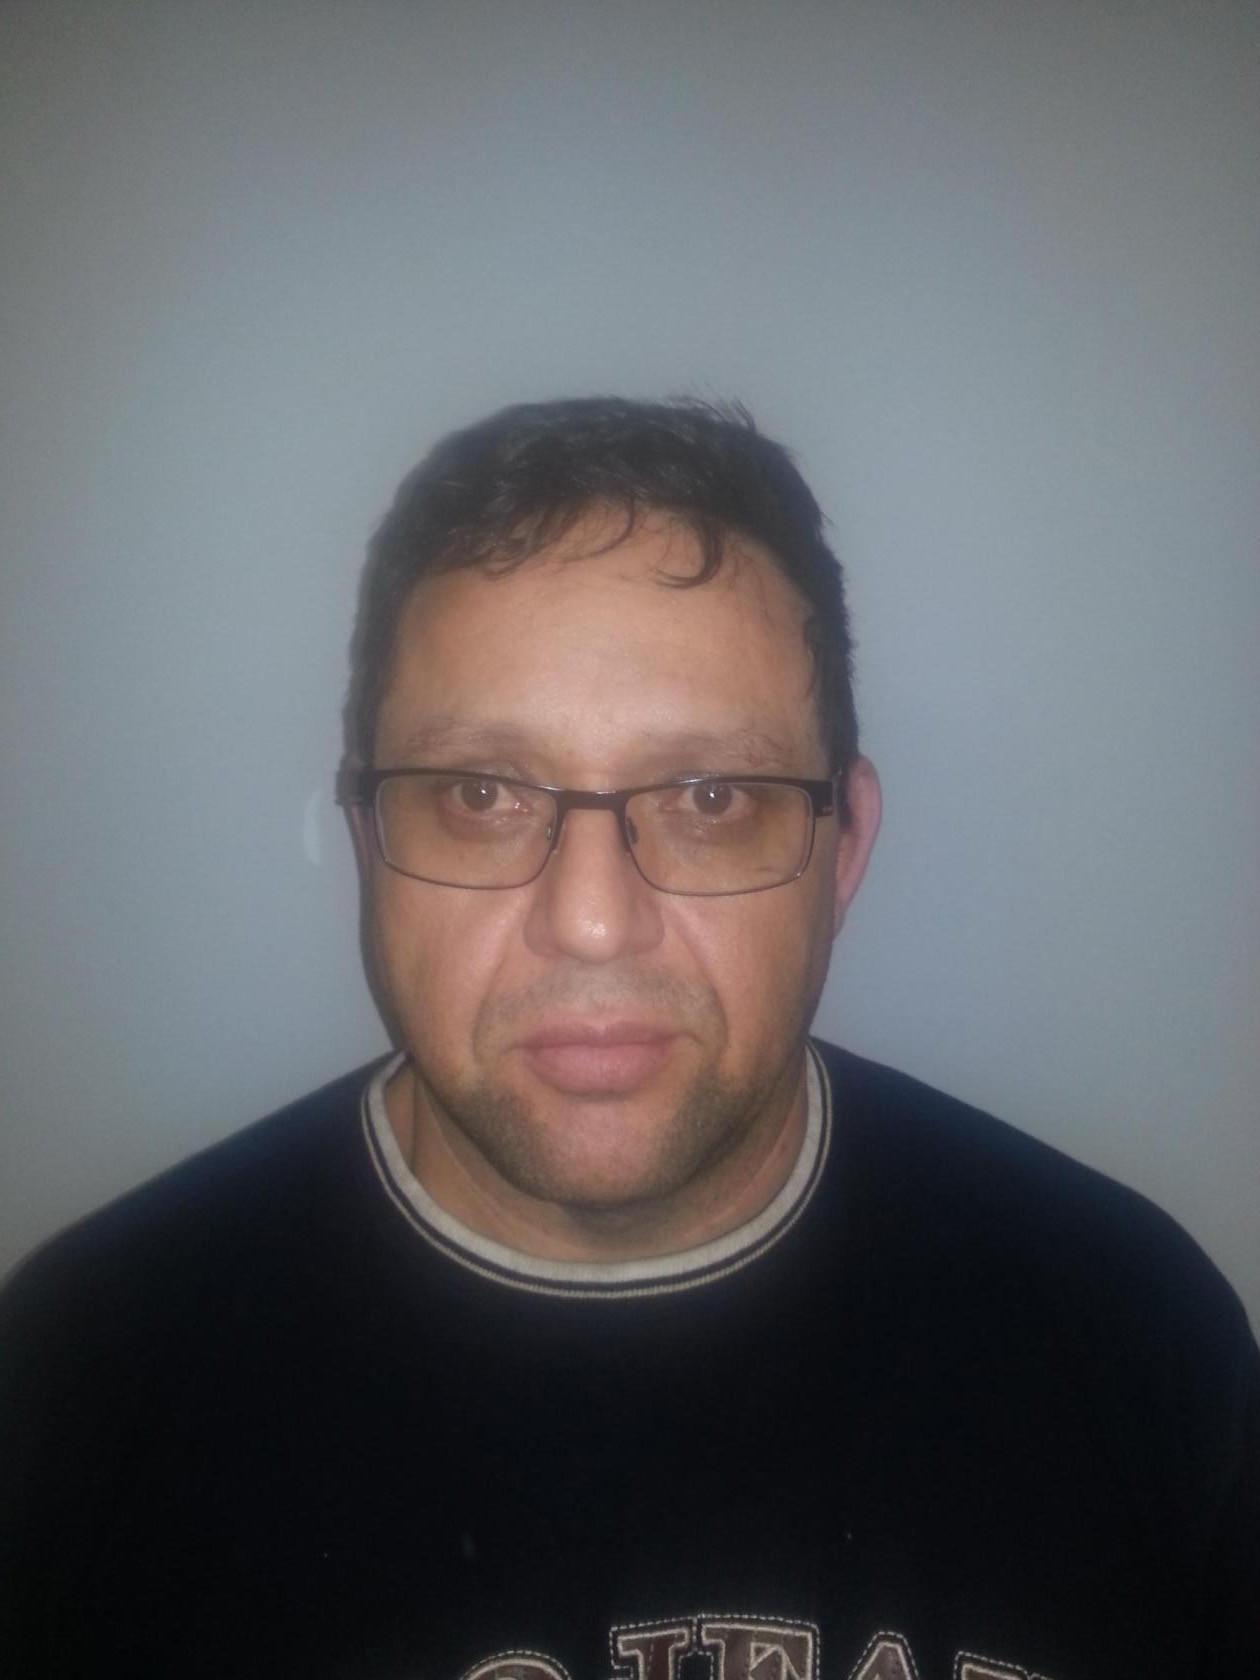 Renato V. Velasquez, 04/19/67, Hanover Park, charged in crash on I-88.